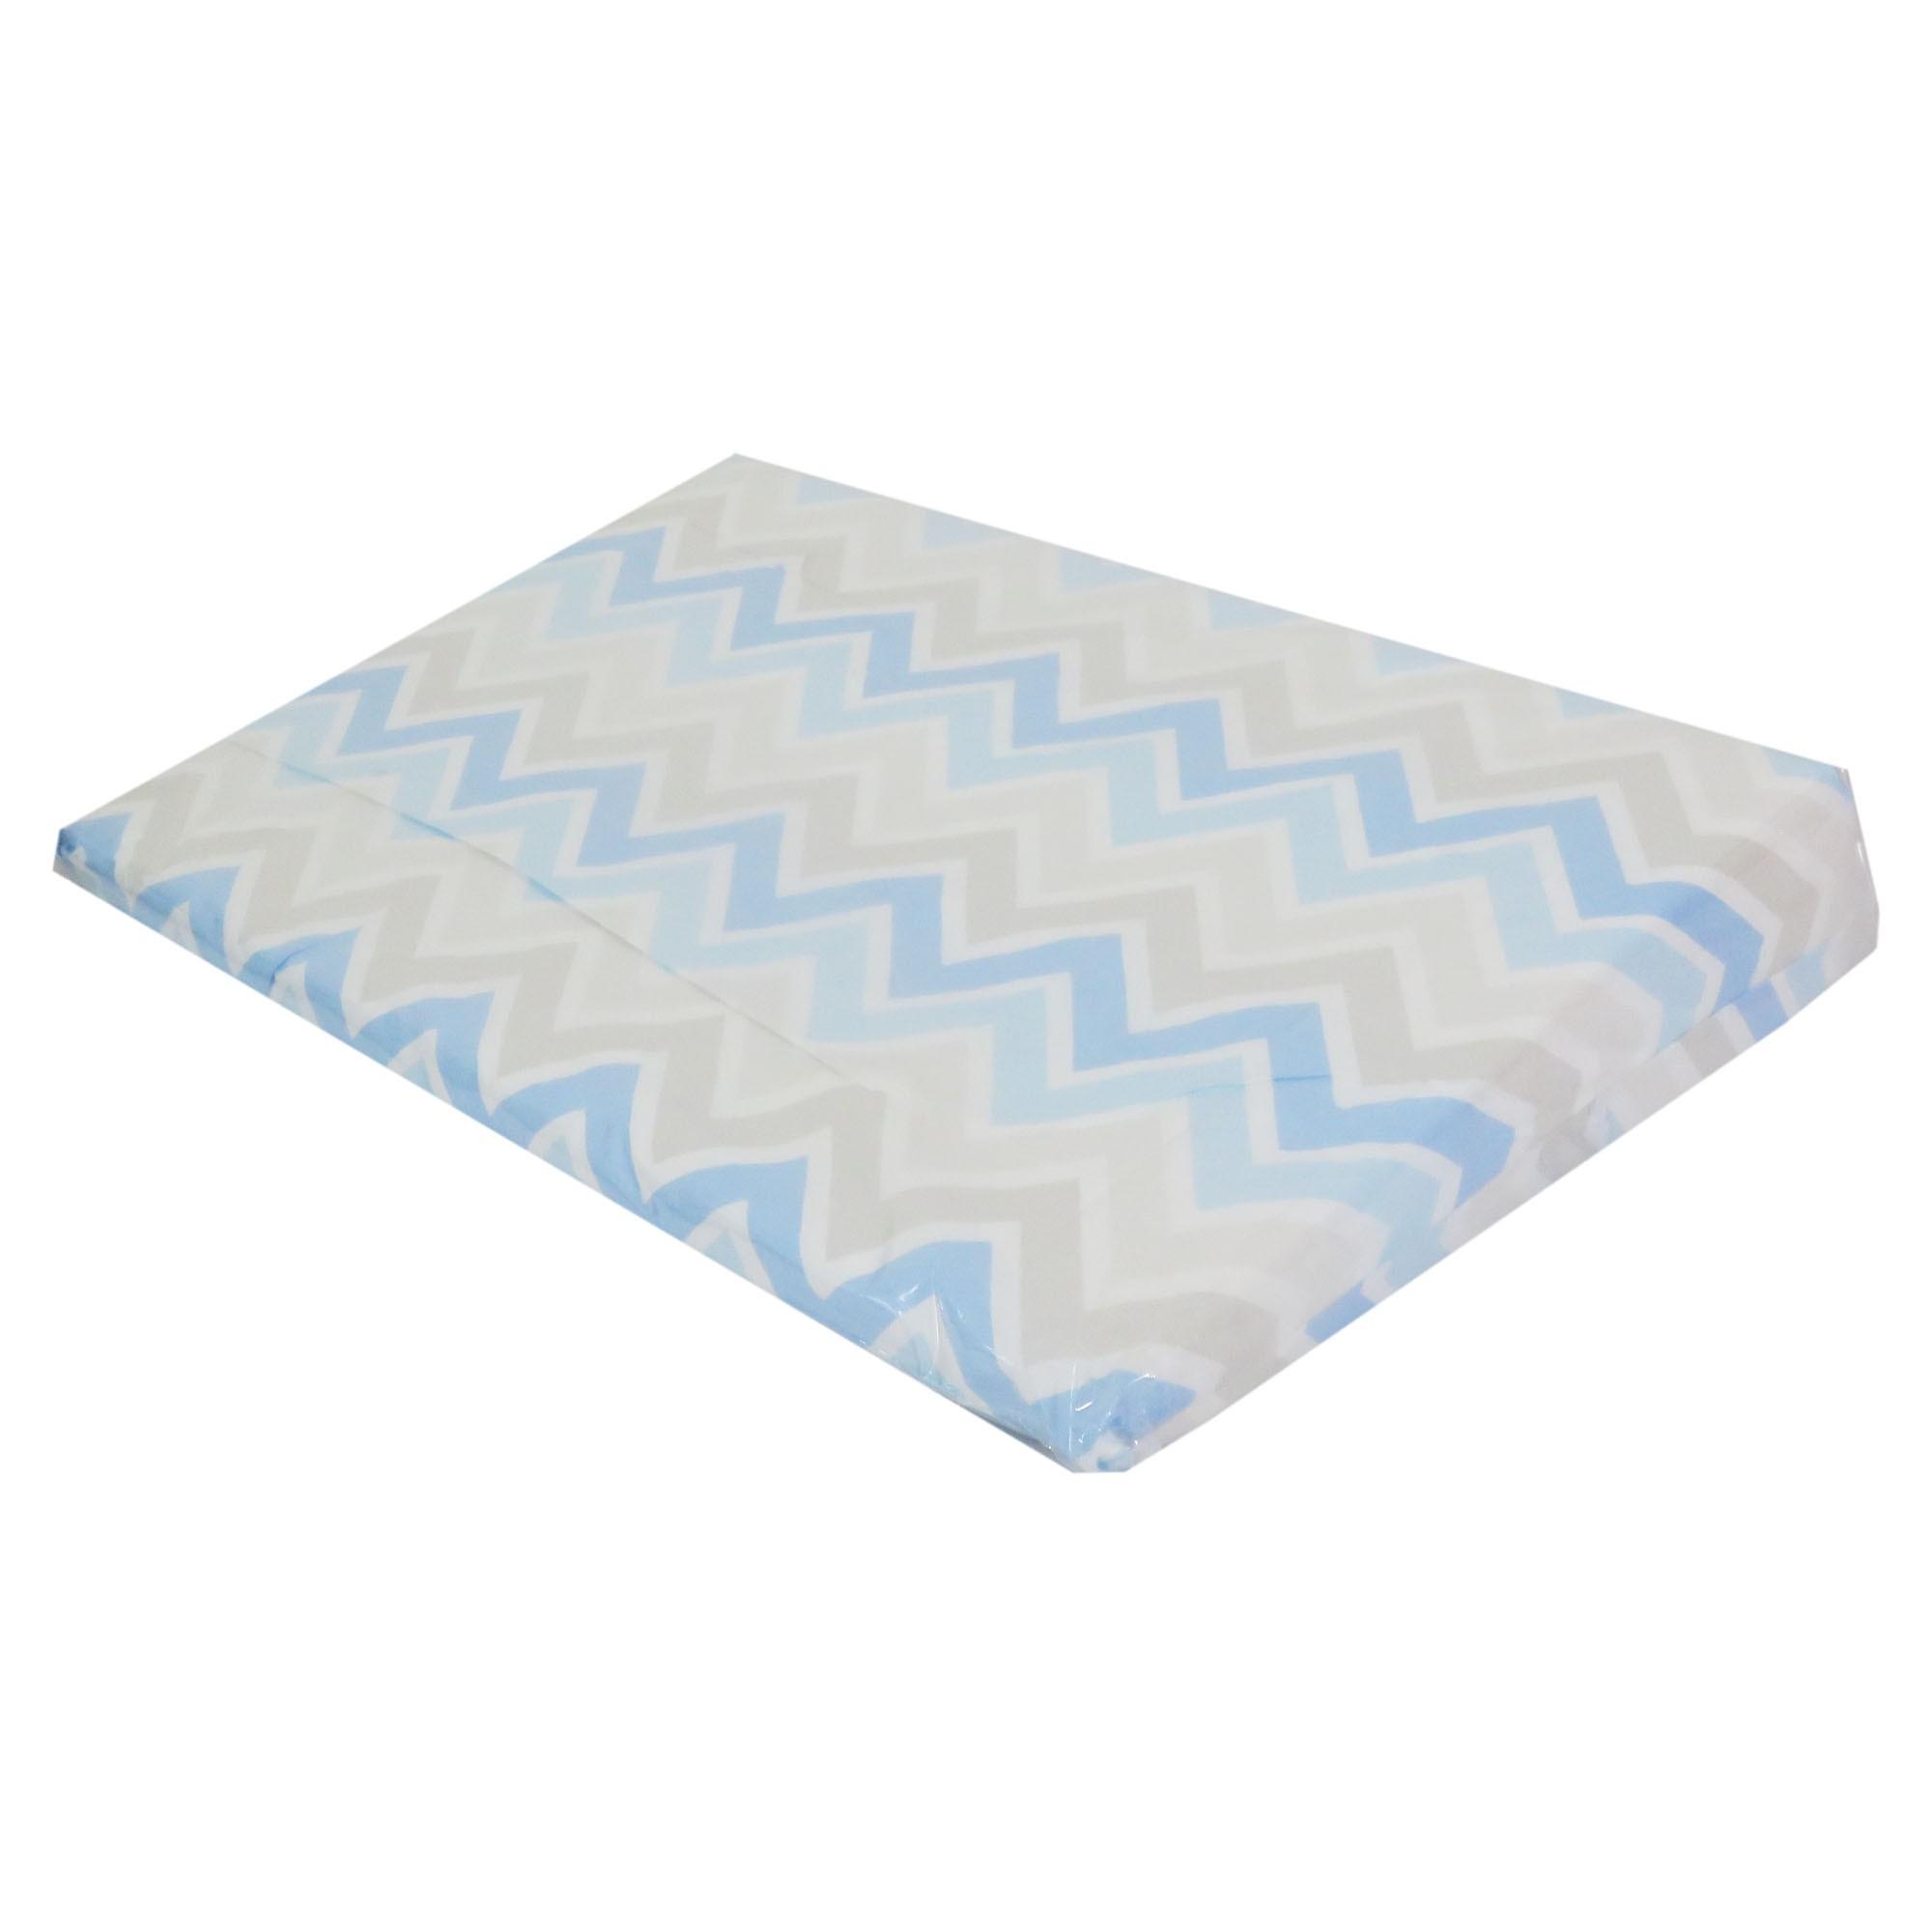 Travesseiro Rampa Estampado - Minasrey - Loupiot Classic